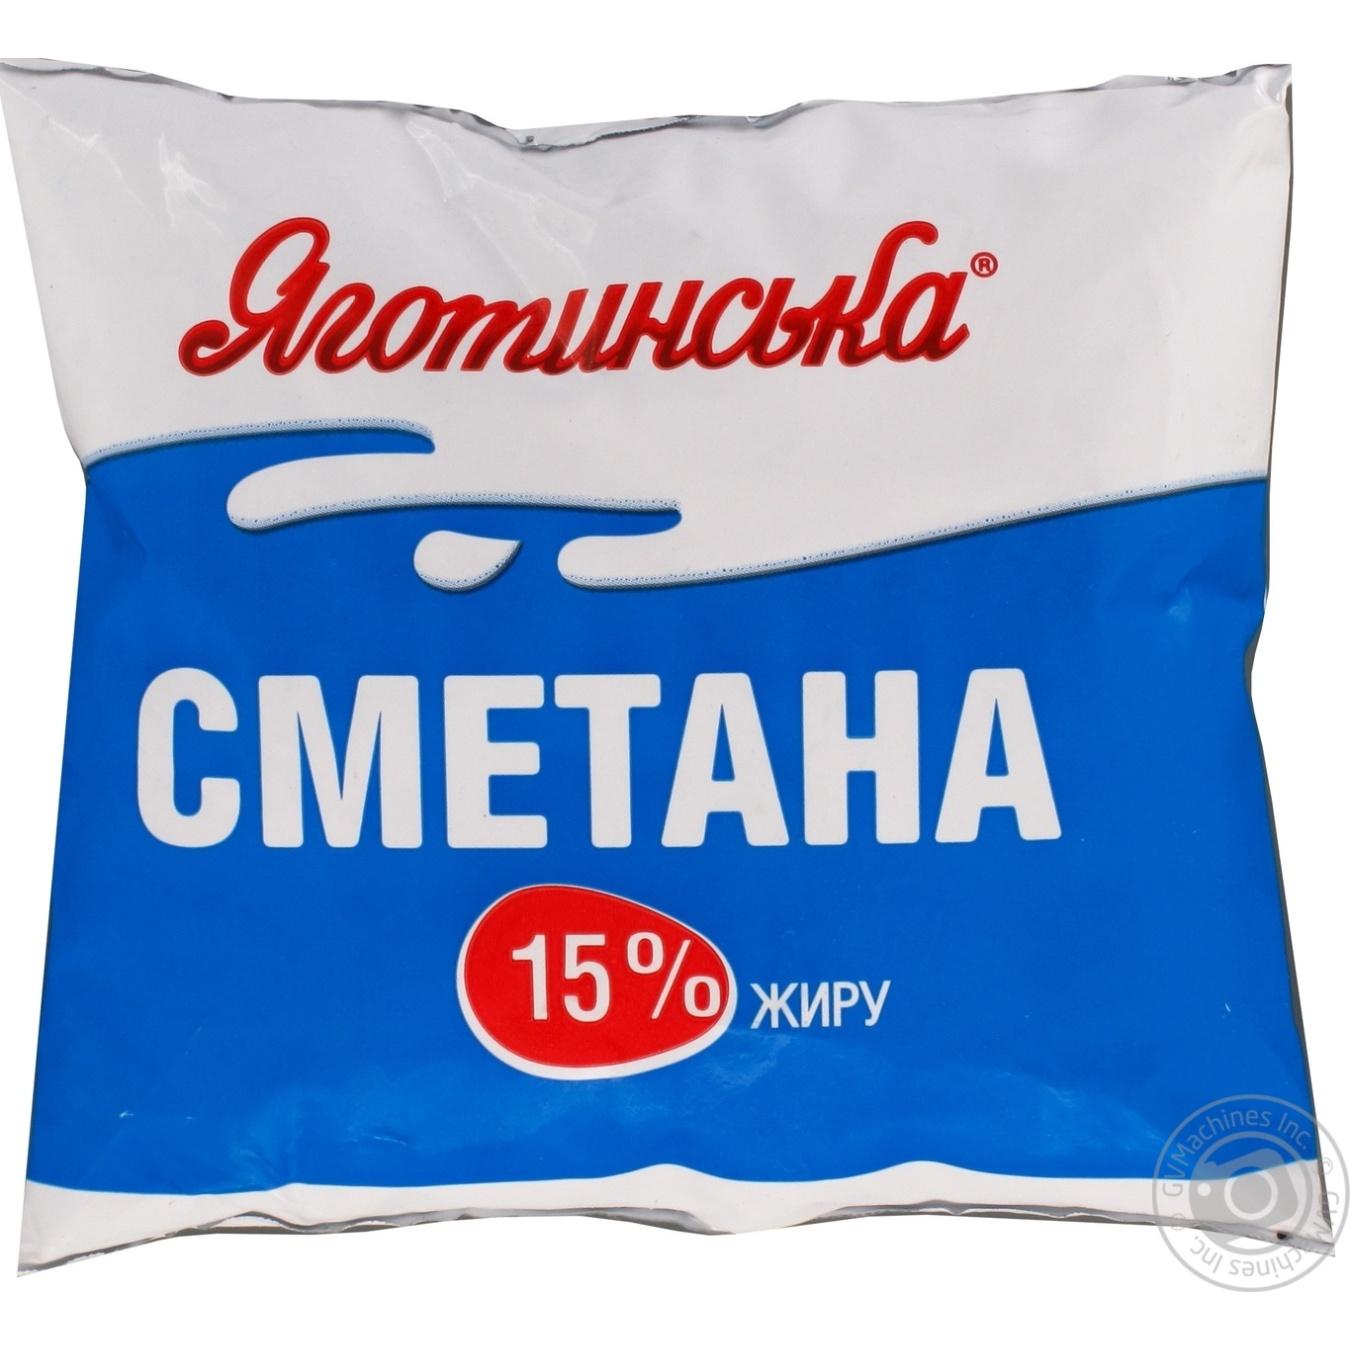 Сметана Яготинская 15% 400г